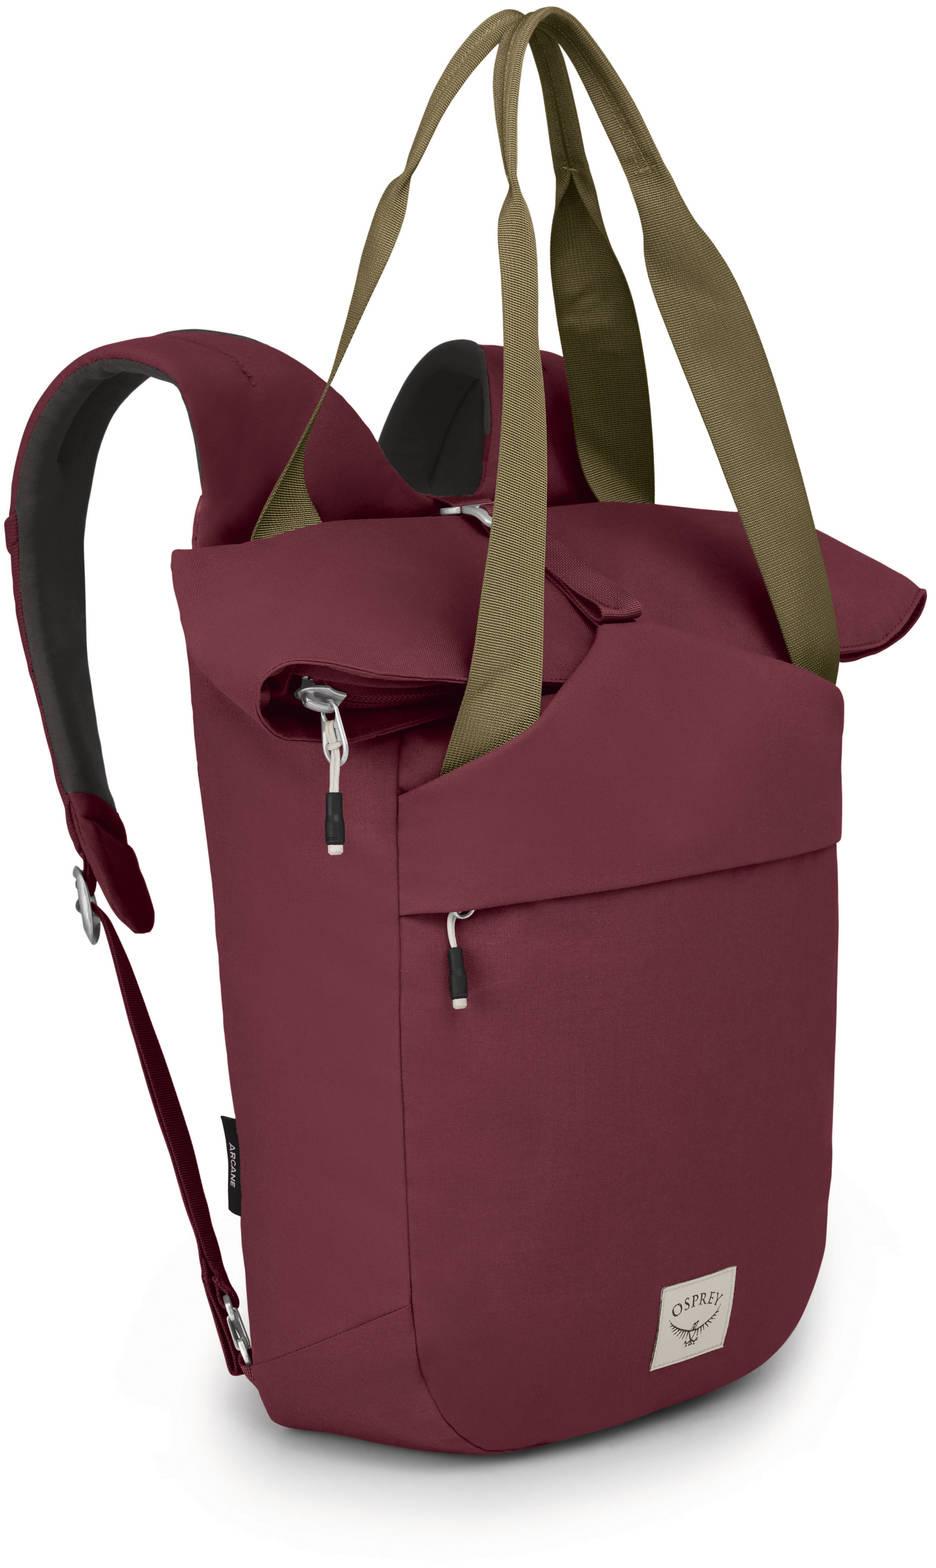 Городские рюкзаки Рюкзак сумка Osprey Arcane Tote Mud Red Arcane_Tote_Pack_S20_Side_Mud_Red_web.jpg